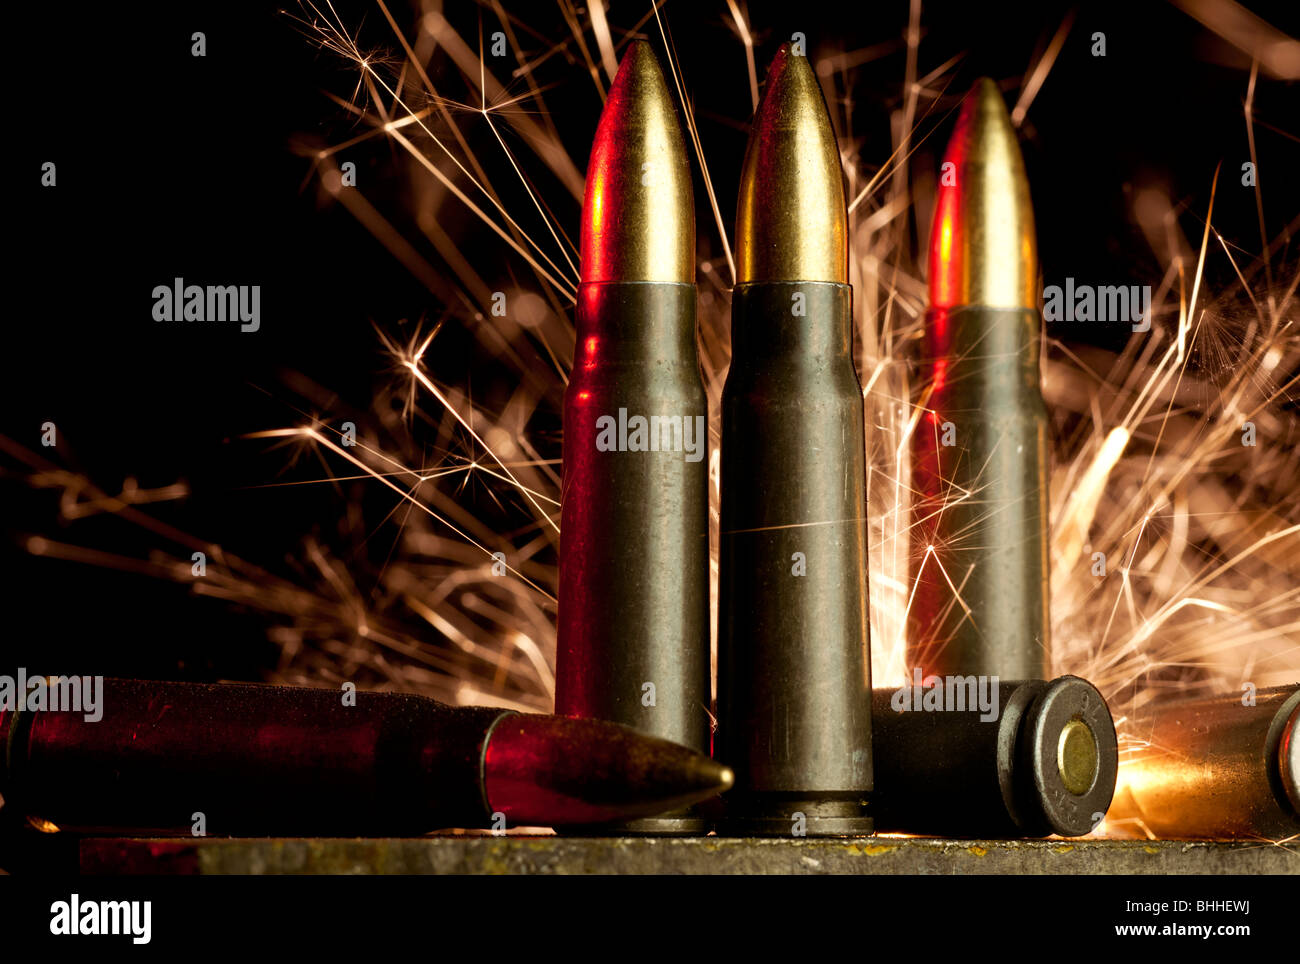 Assault rifle cartridges - Stock Image